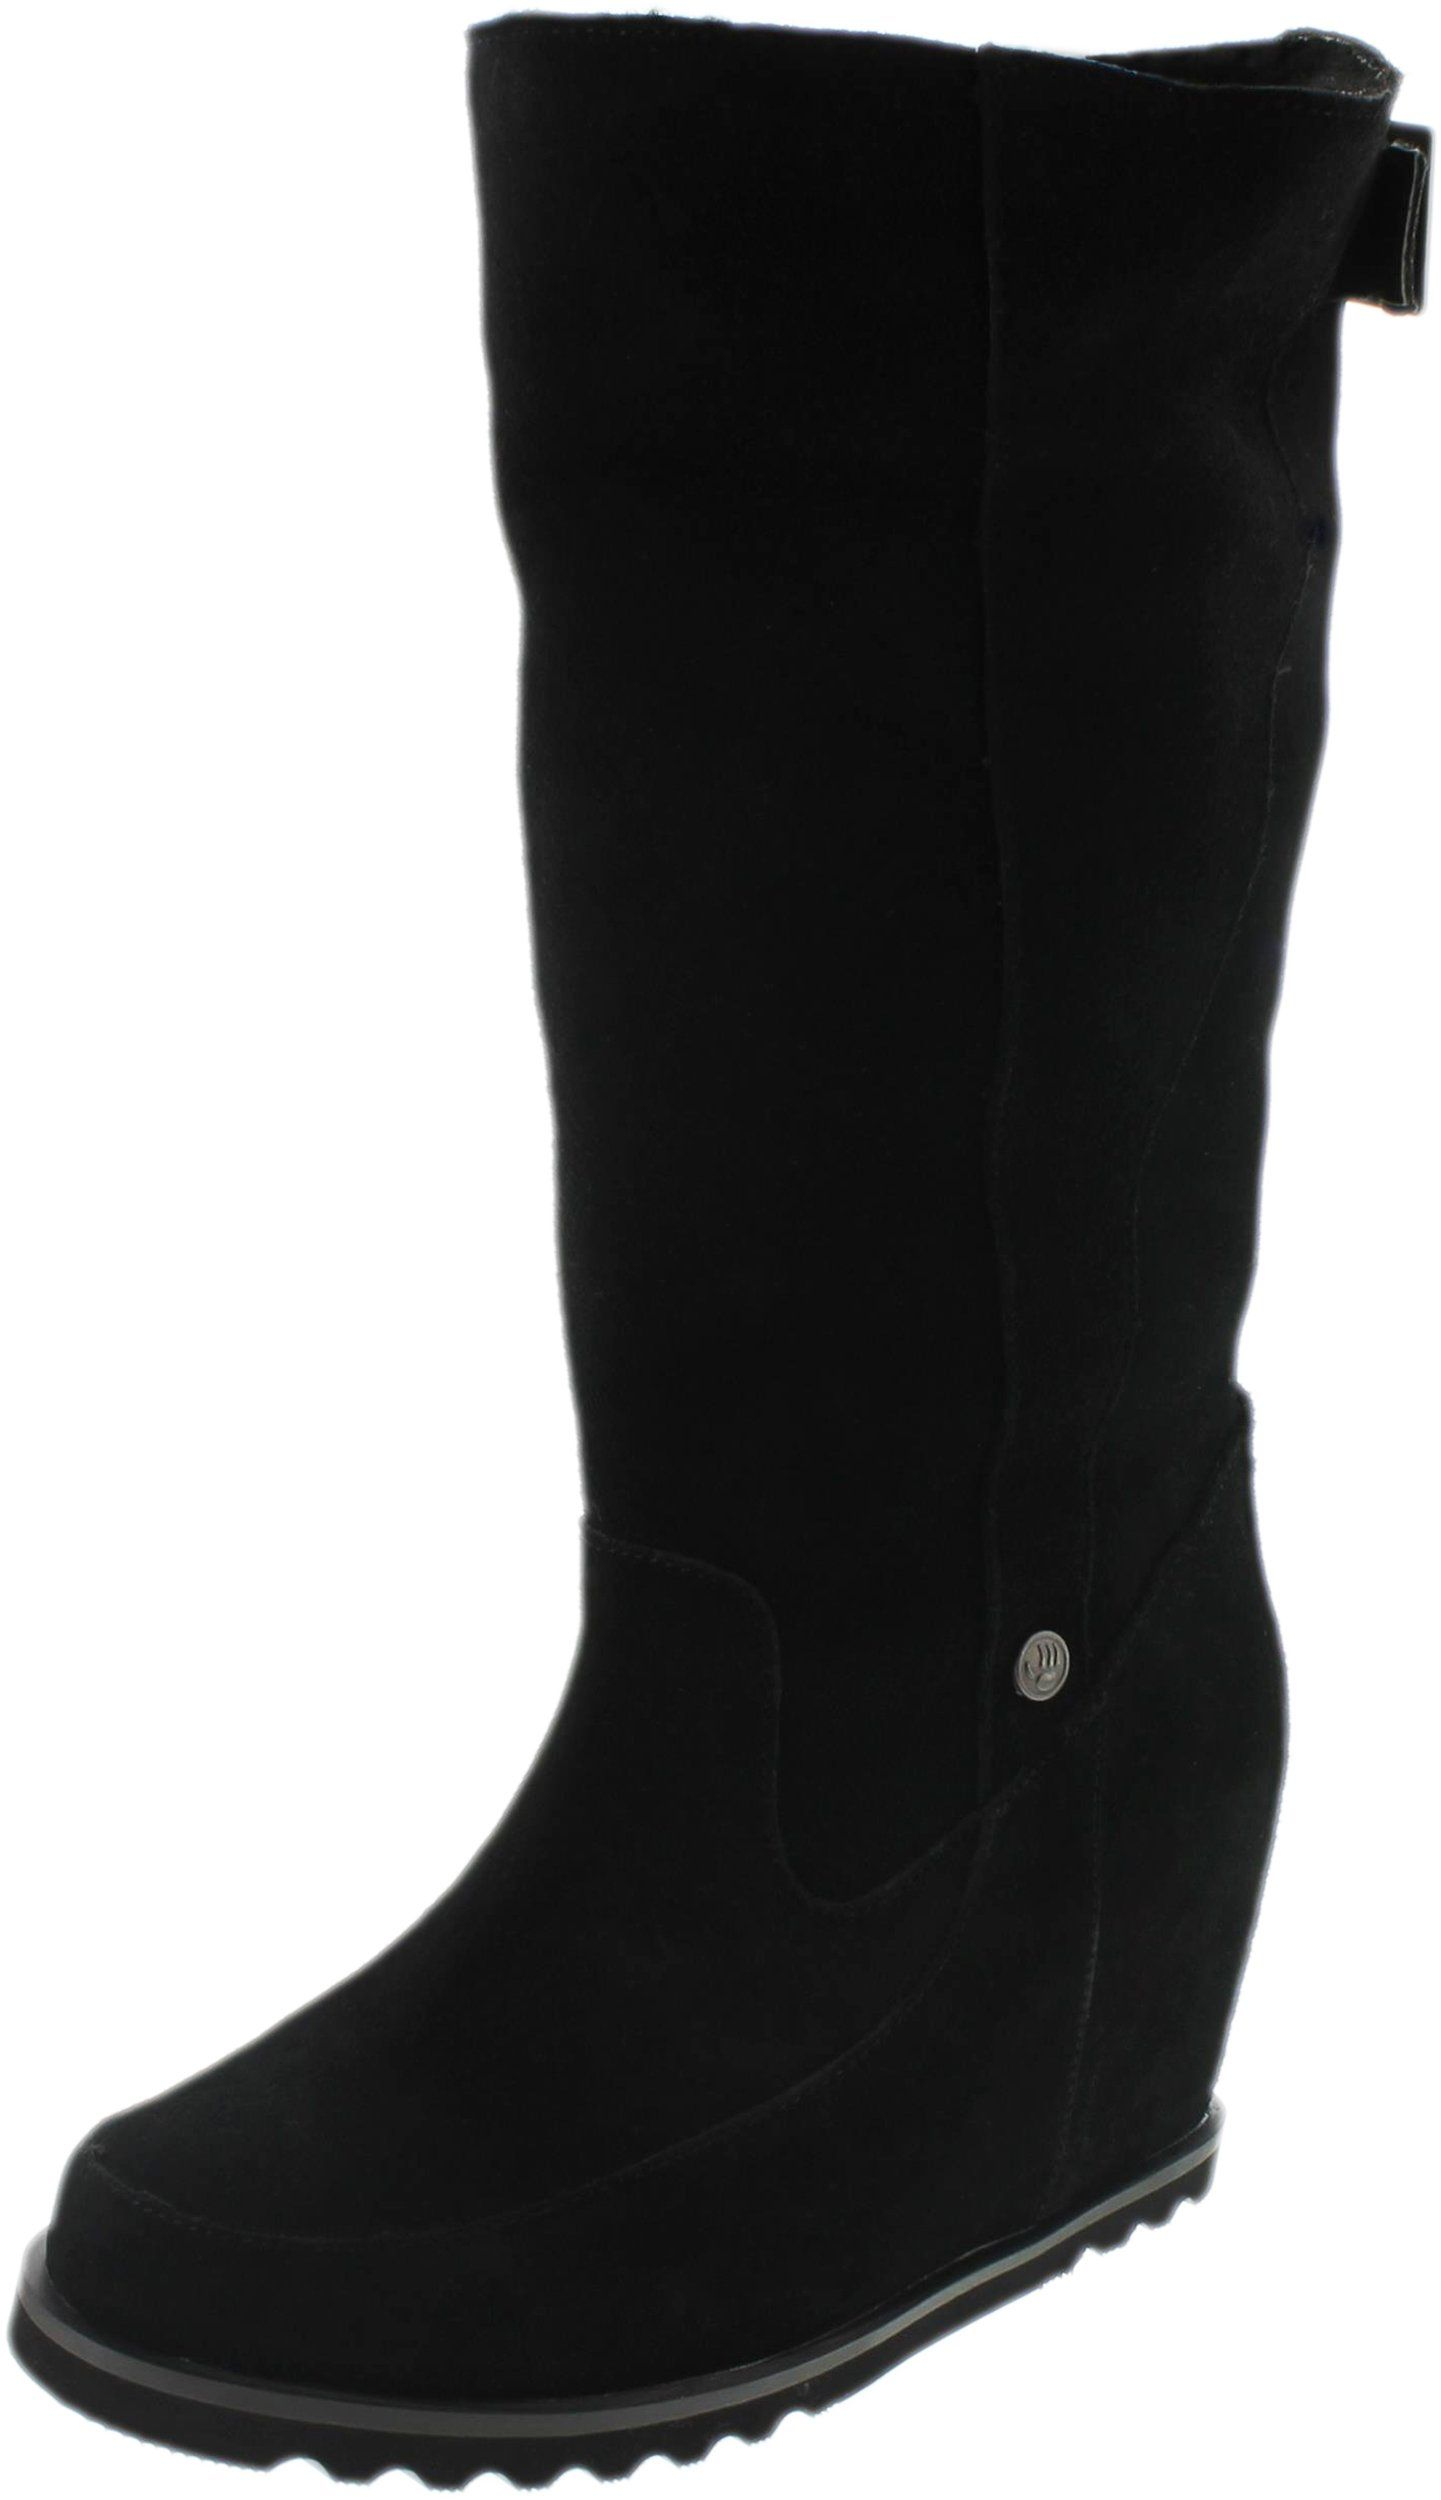 promo code 8792a e0f20 Amazon.com: BEARPAW Women's Cressida Snow Boot: Bearpaw ...